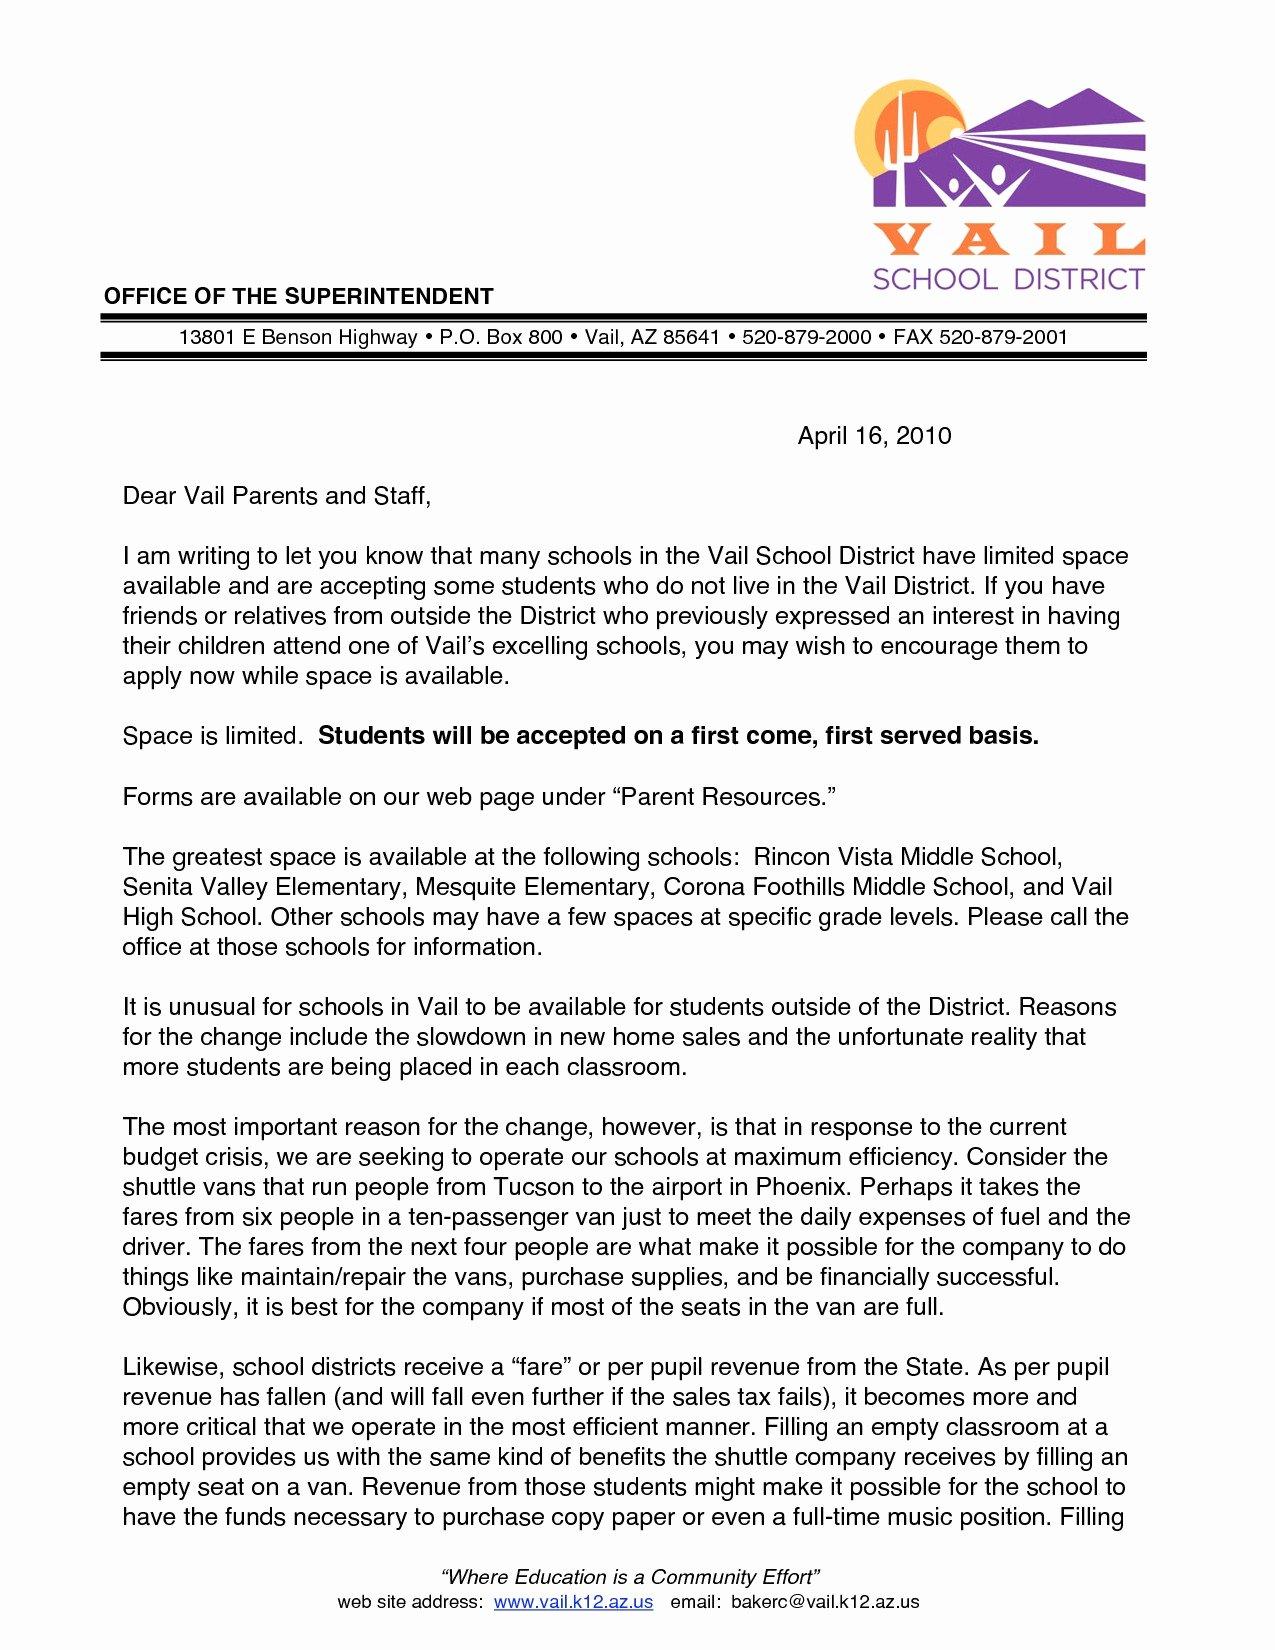 Open Enrollment Letters to Employees Elegant Open Enrollment Template Letter Sample